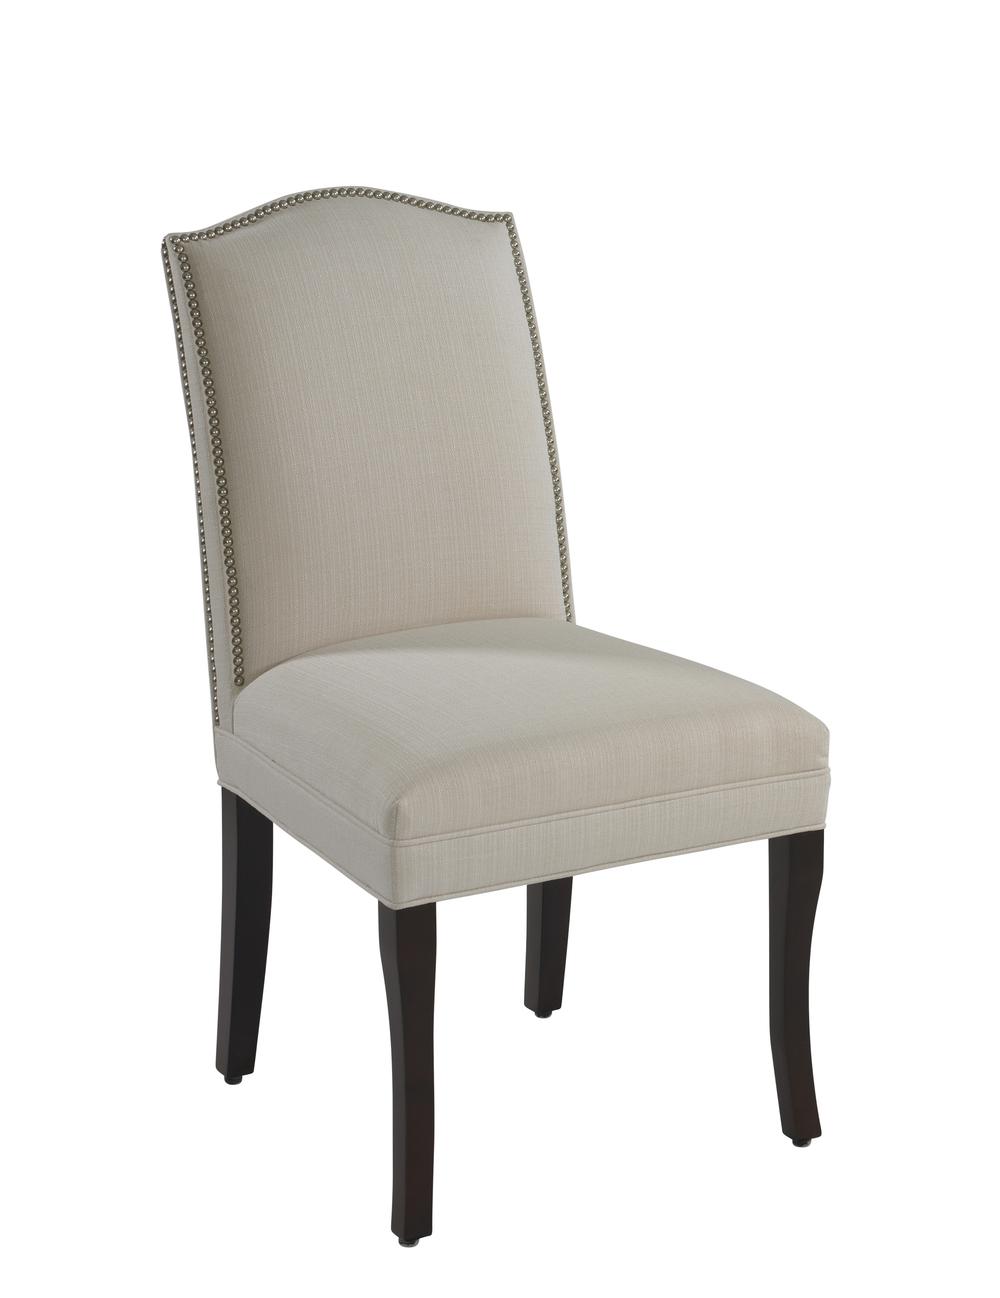 Designmaster Furniture - Lynchburg Side Chair